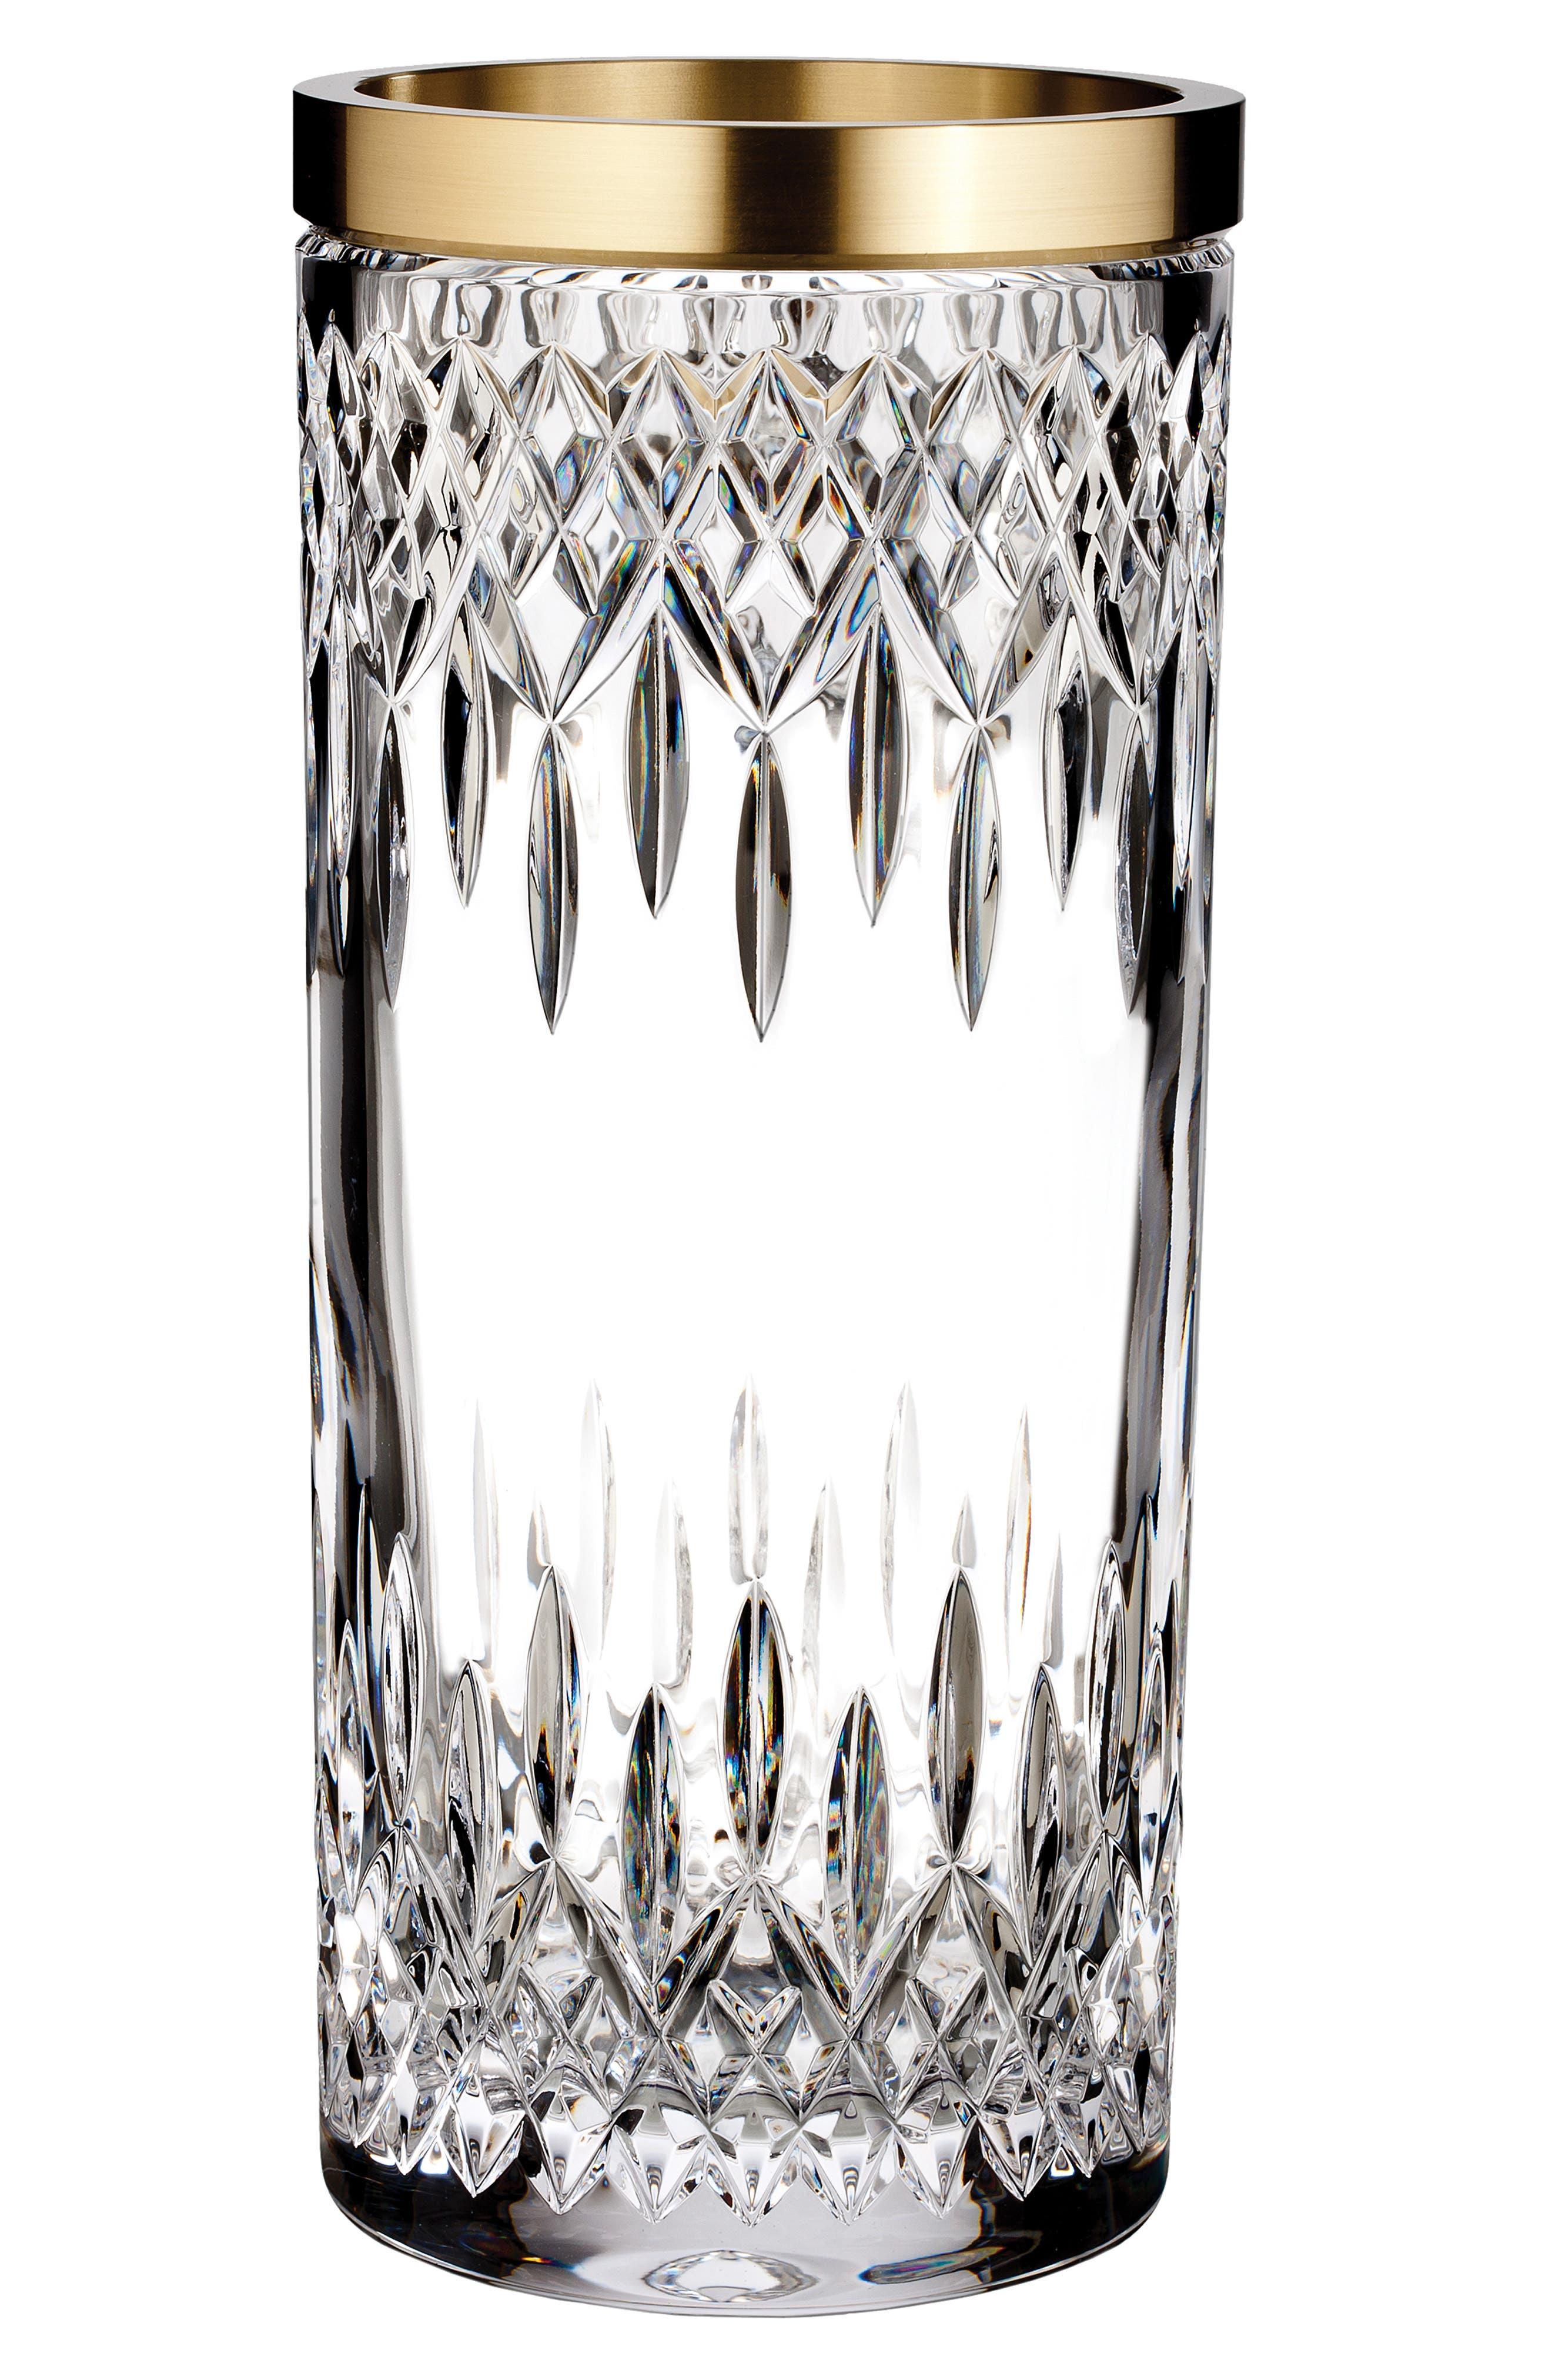 Lismore Reflection 12-Inch Lead Crystal Vase,                             Main thumbnail 1, color,                             CRYSTAL